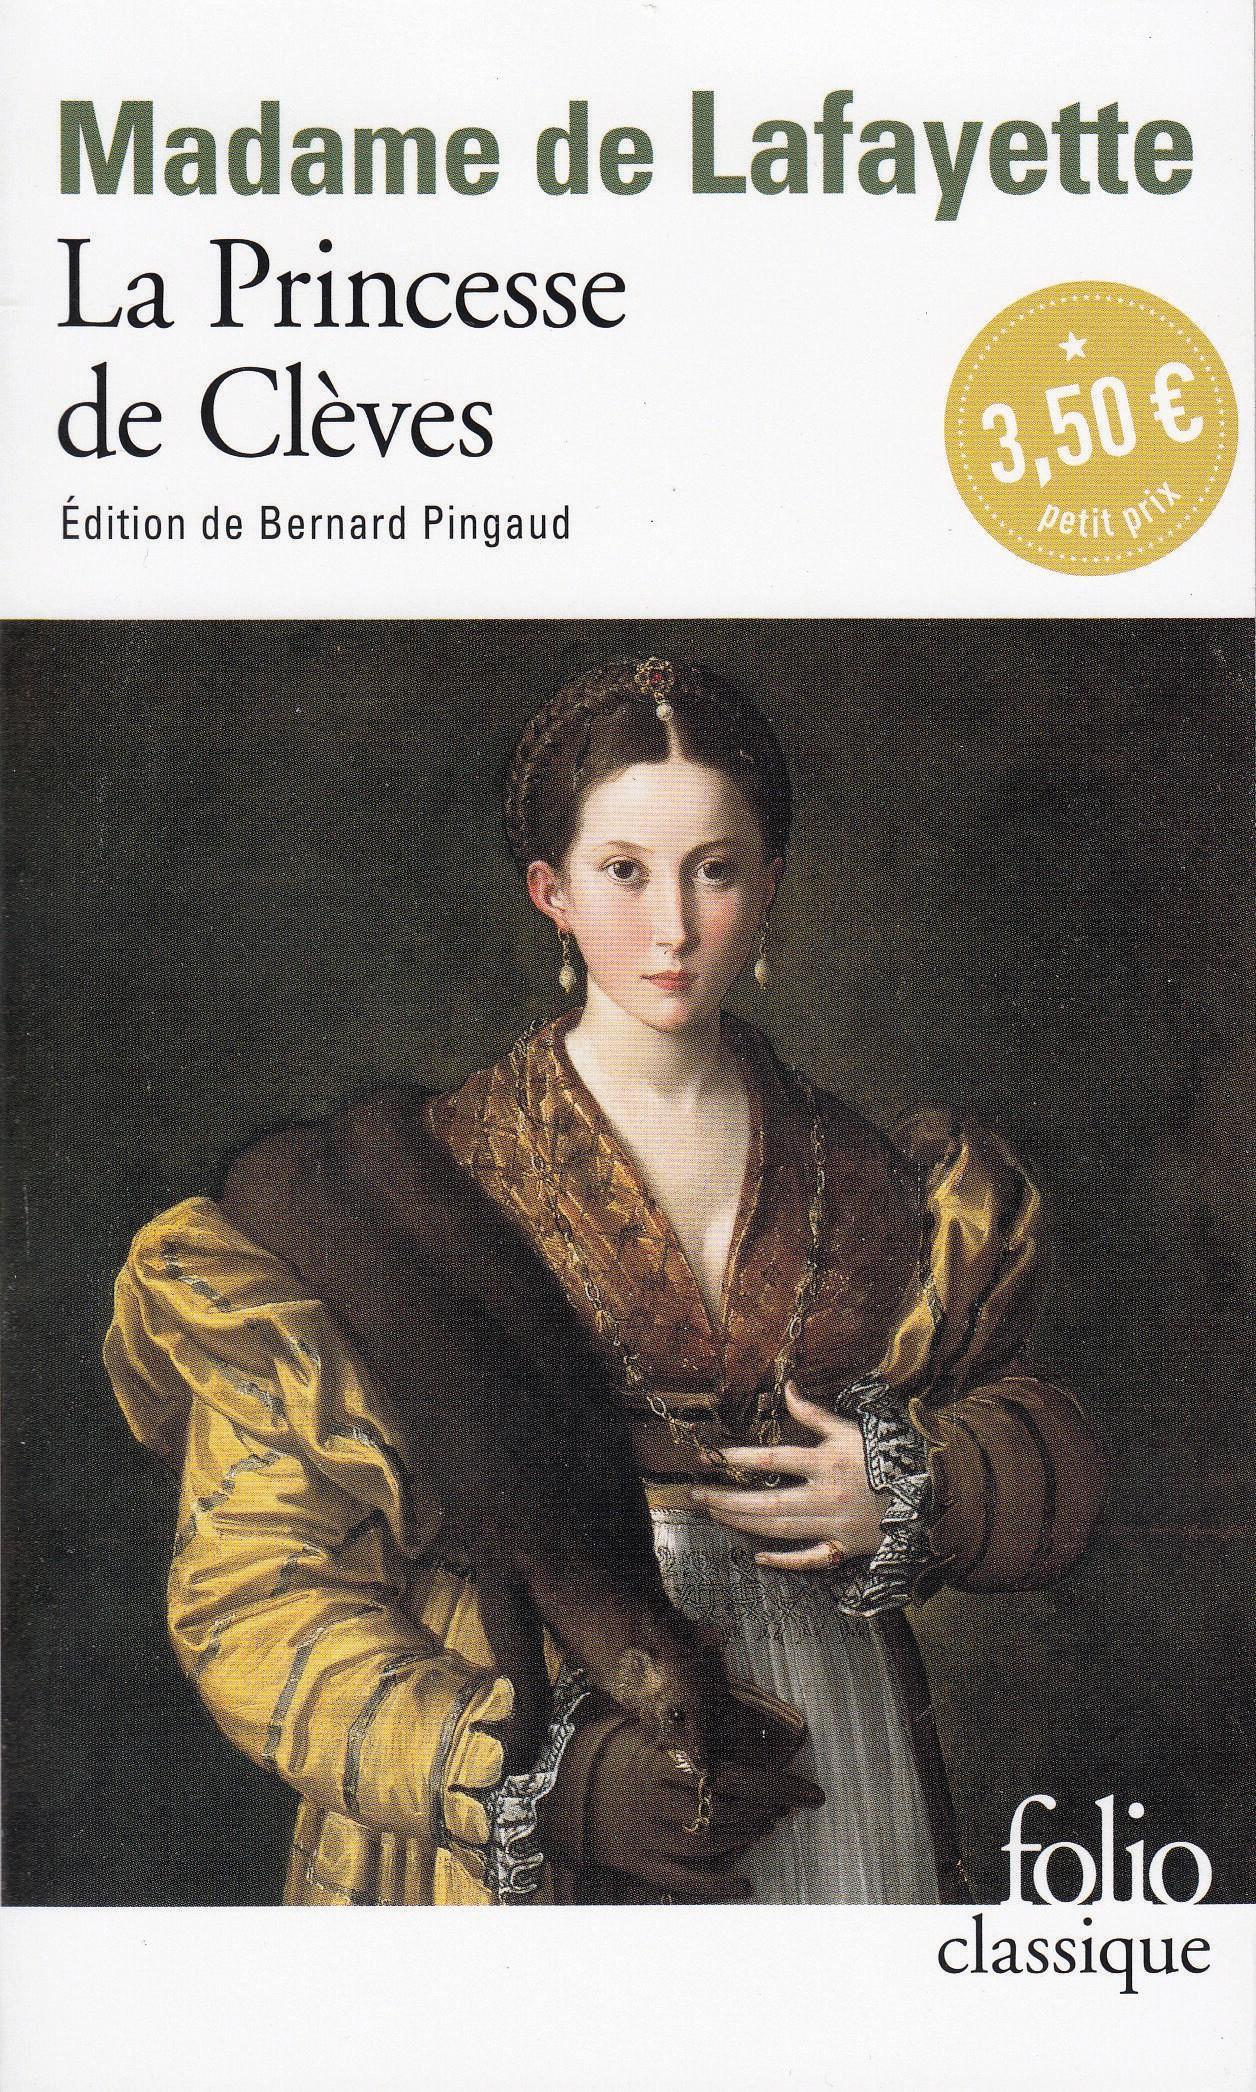 La Princesse de Clèves Madame de Lafayette